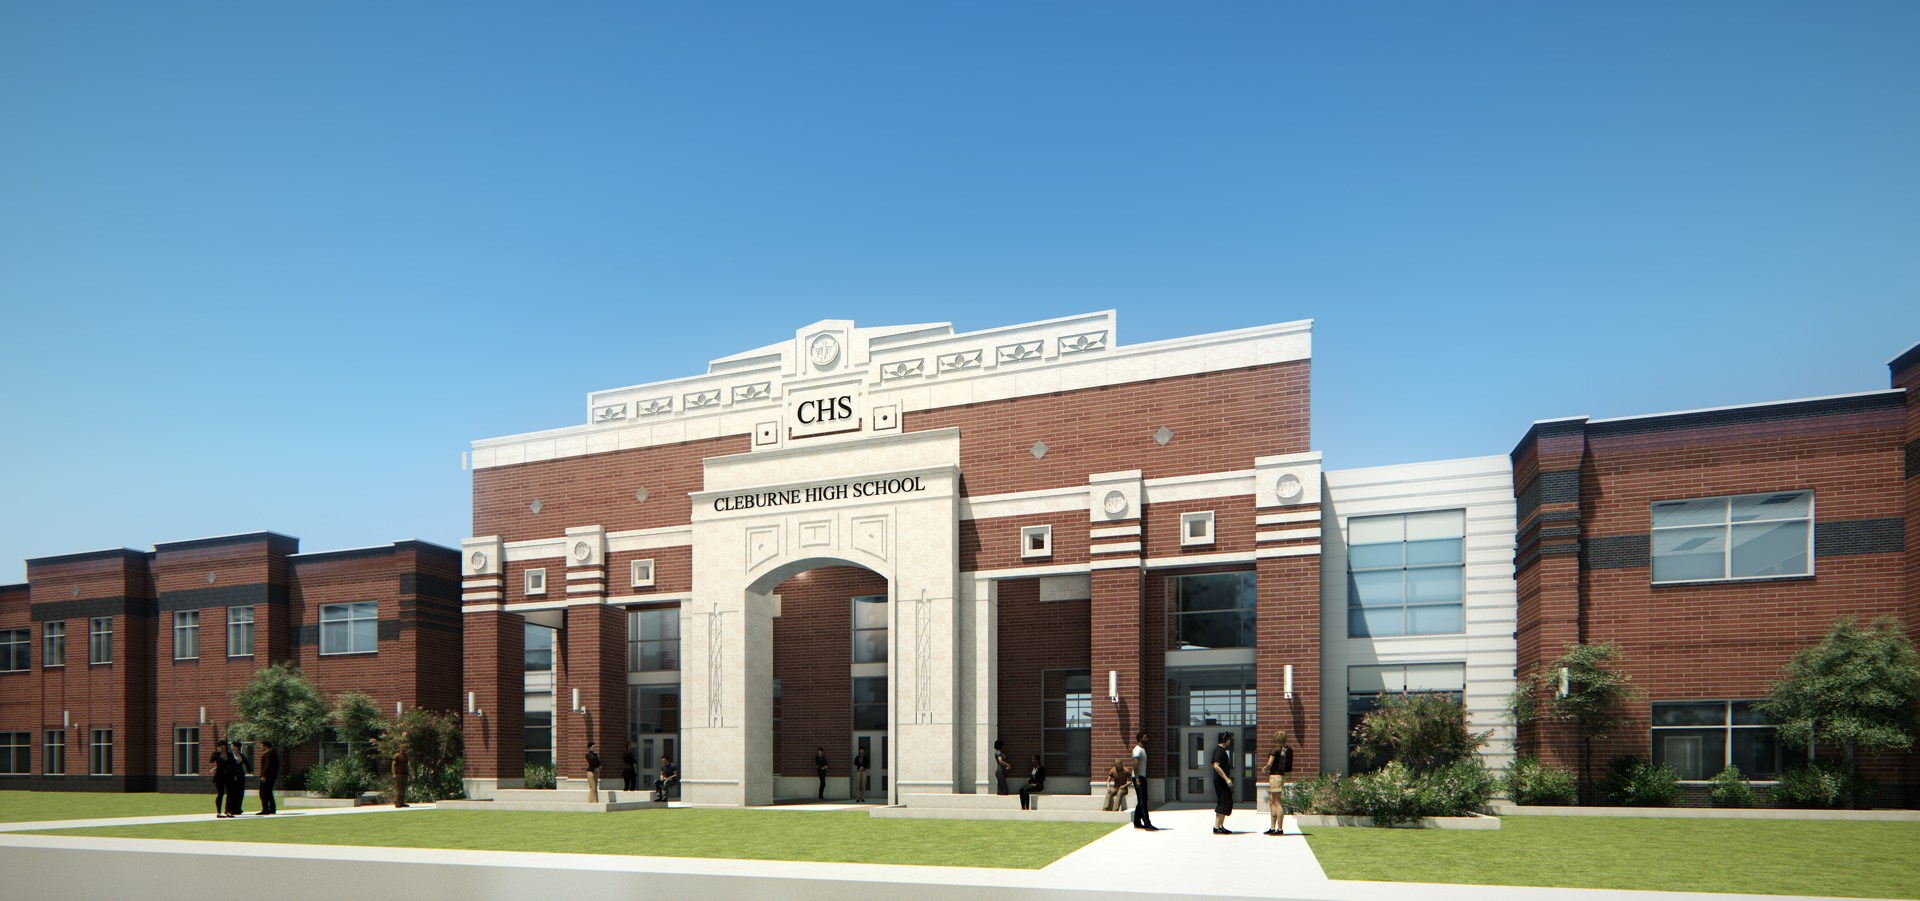 Cleburne High School